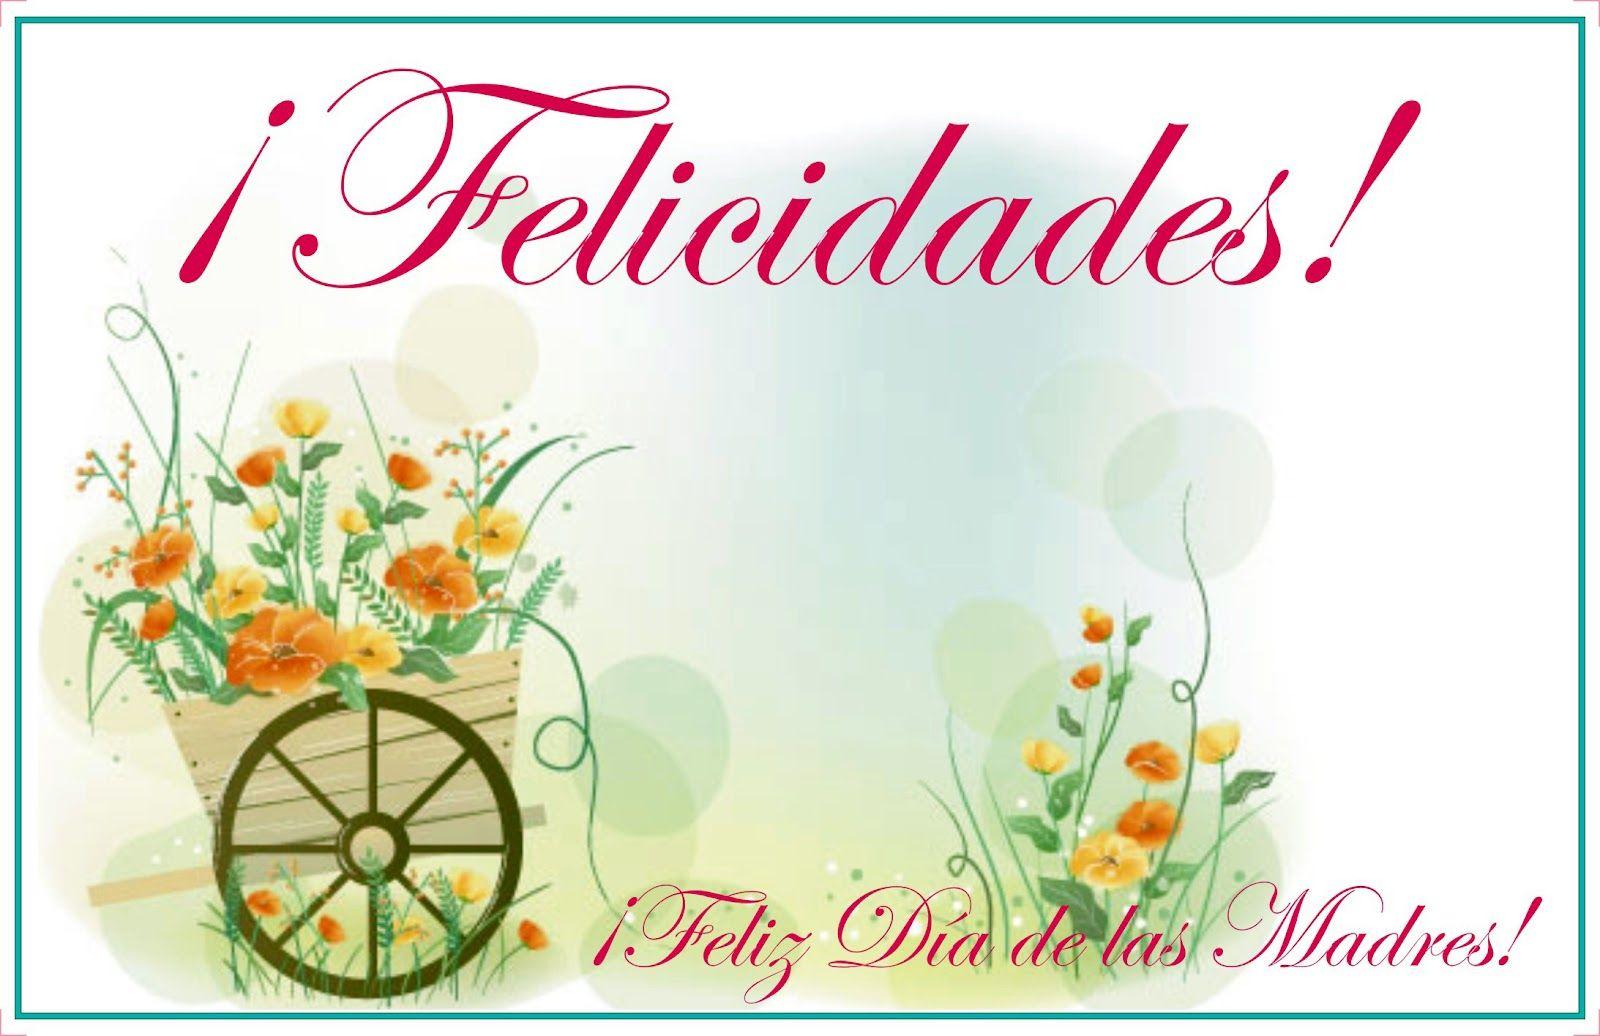 Dia De La Madre Wallpapers: Tarjetas De Cumpleaños Madre Para Ver Desde El Celular E